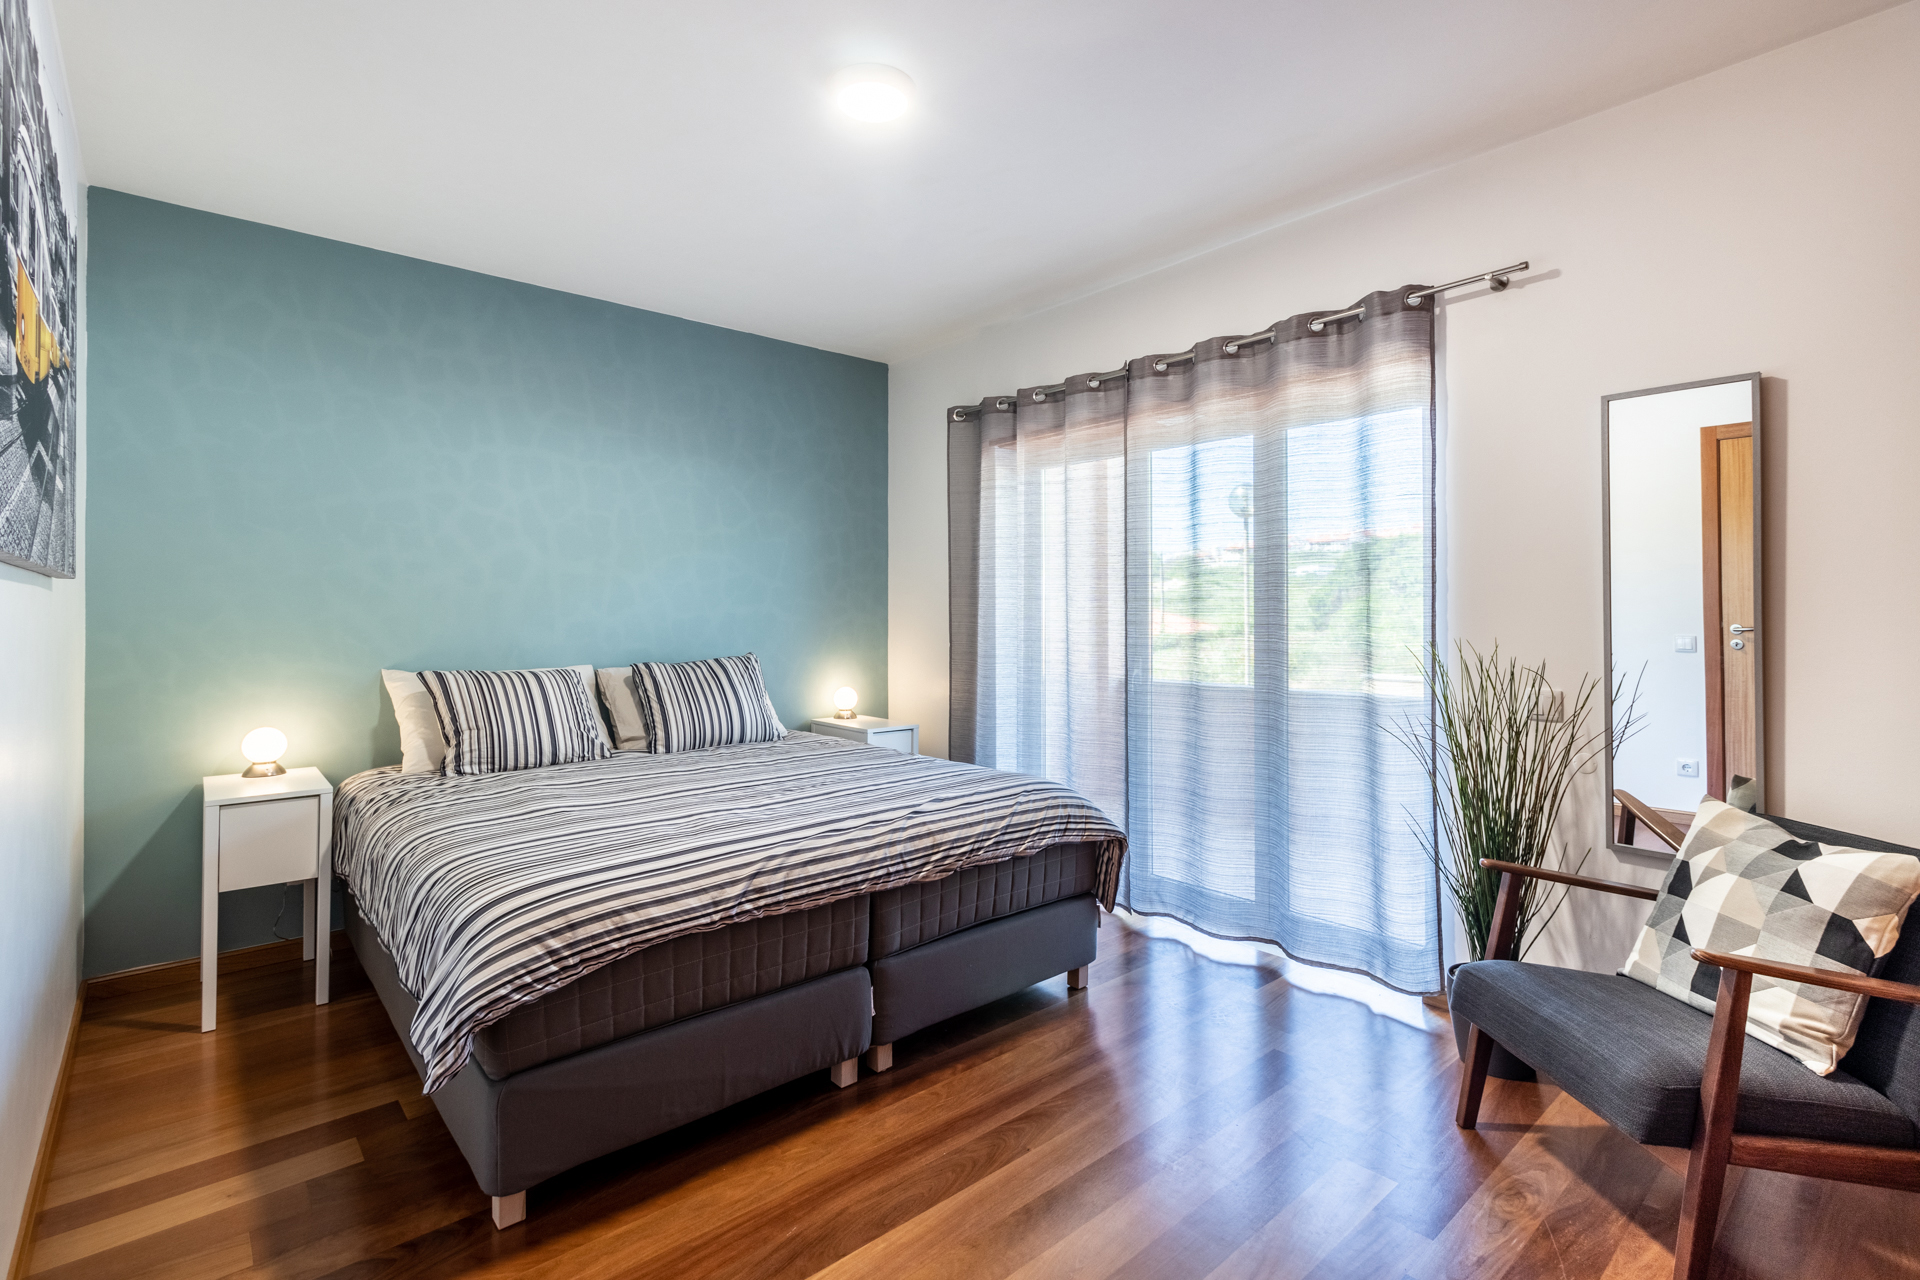 Quarto de casal com varanda / Double Bedroom with balcony